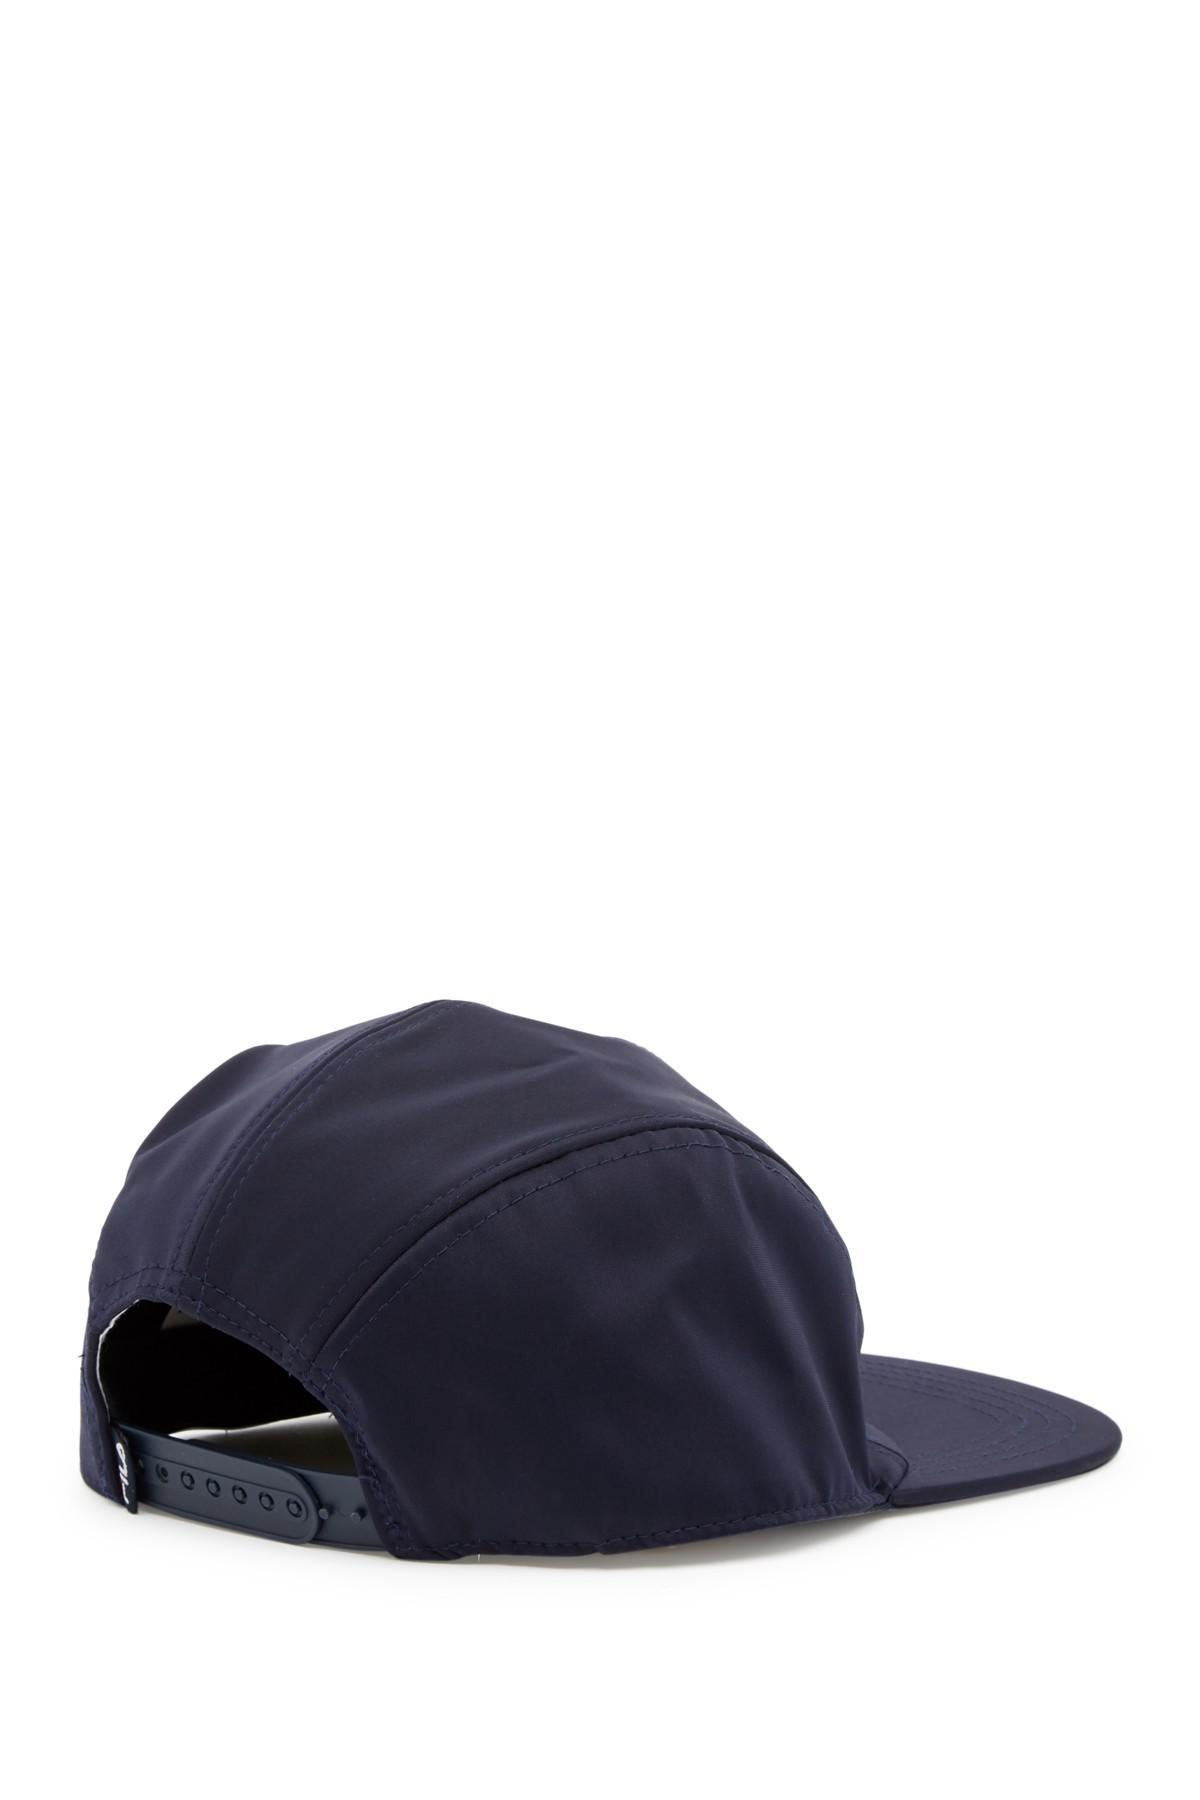 458abfdd909 Lyst - Fila Heritage Neoprene 5 Panel Camper Hat in Blue for Men